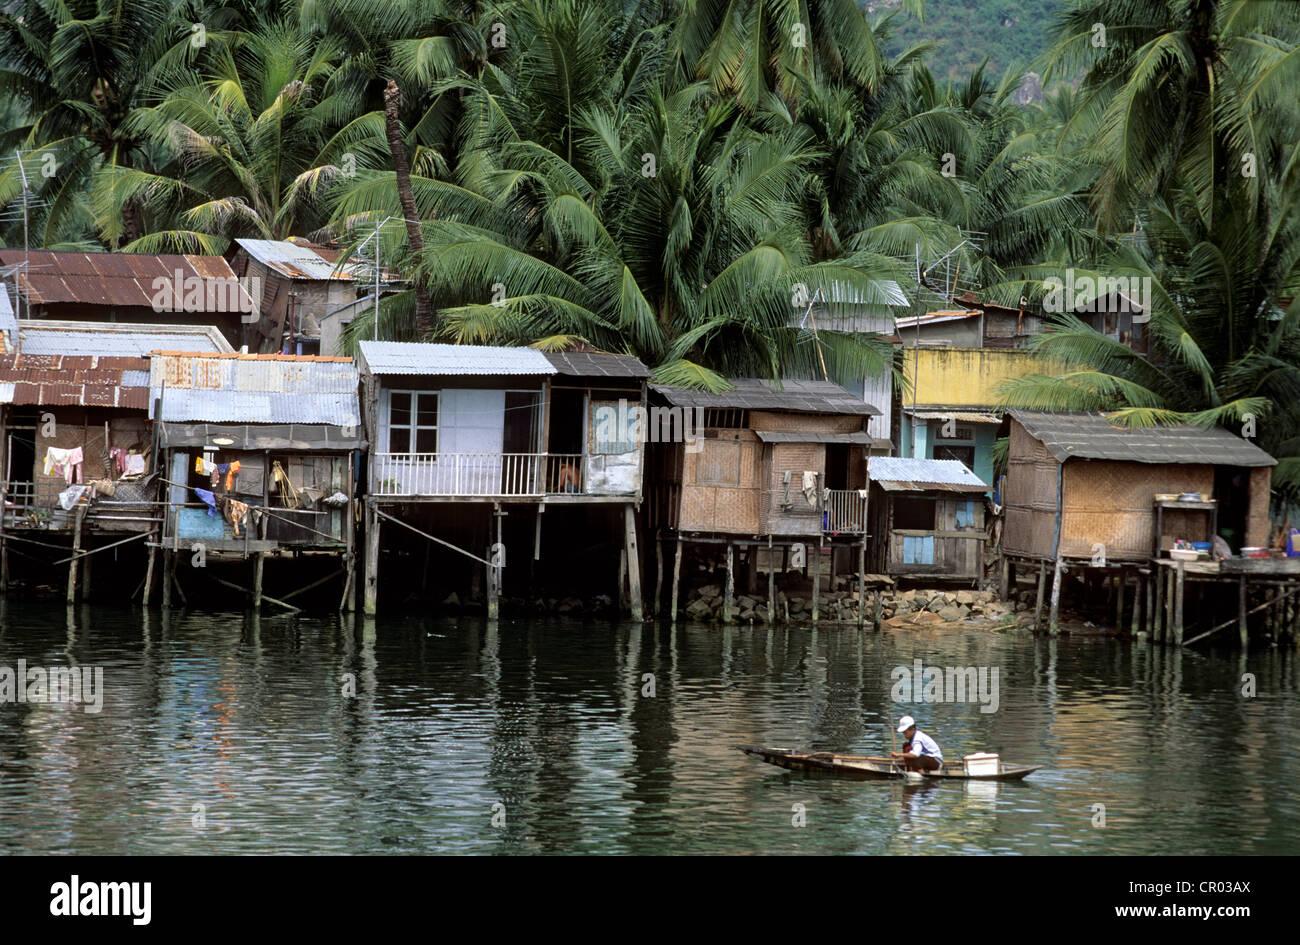 Vietnam, Khanh Hoa Province, Nha Trang, fishermen village on stilts - Stock Image